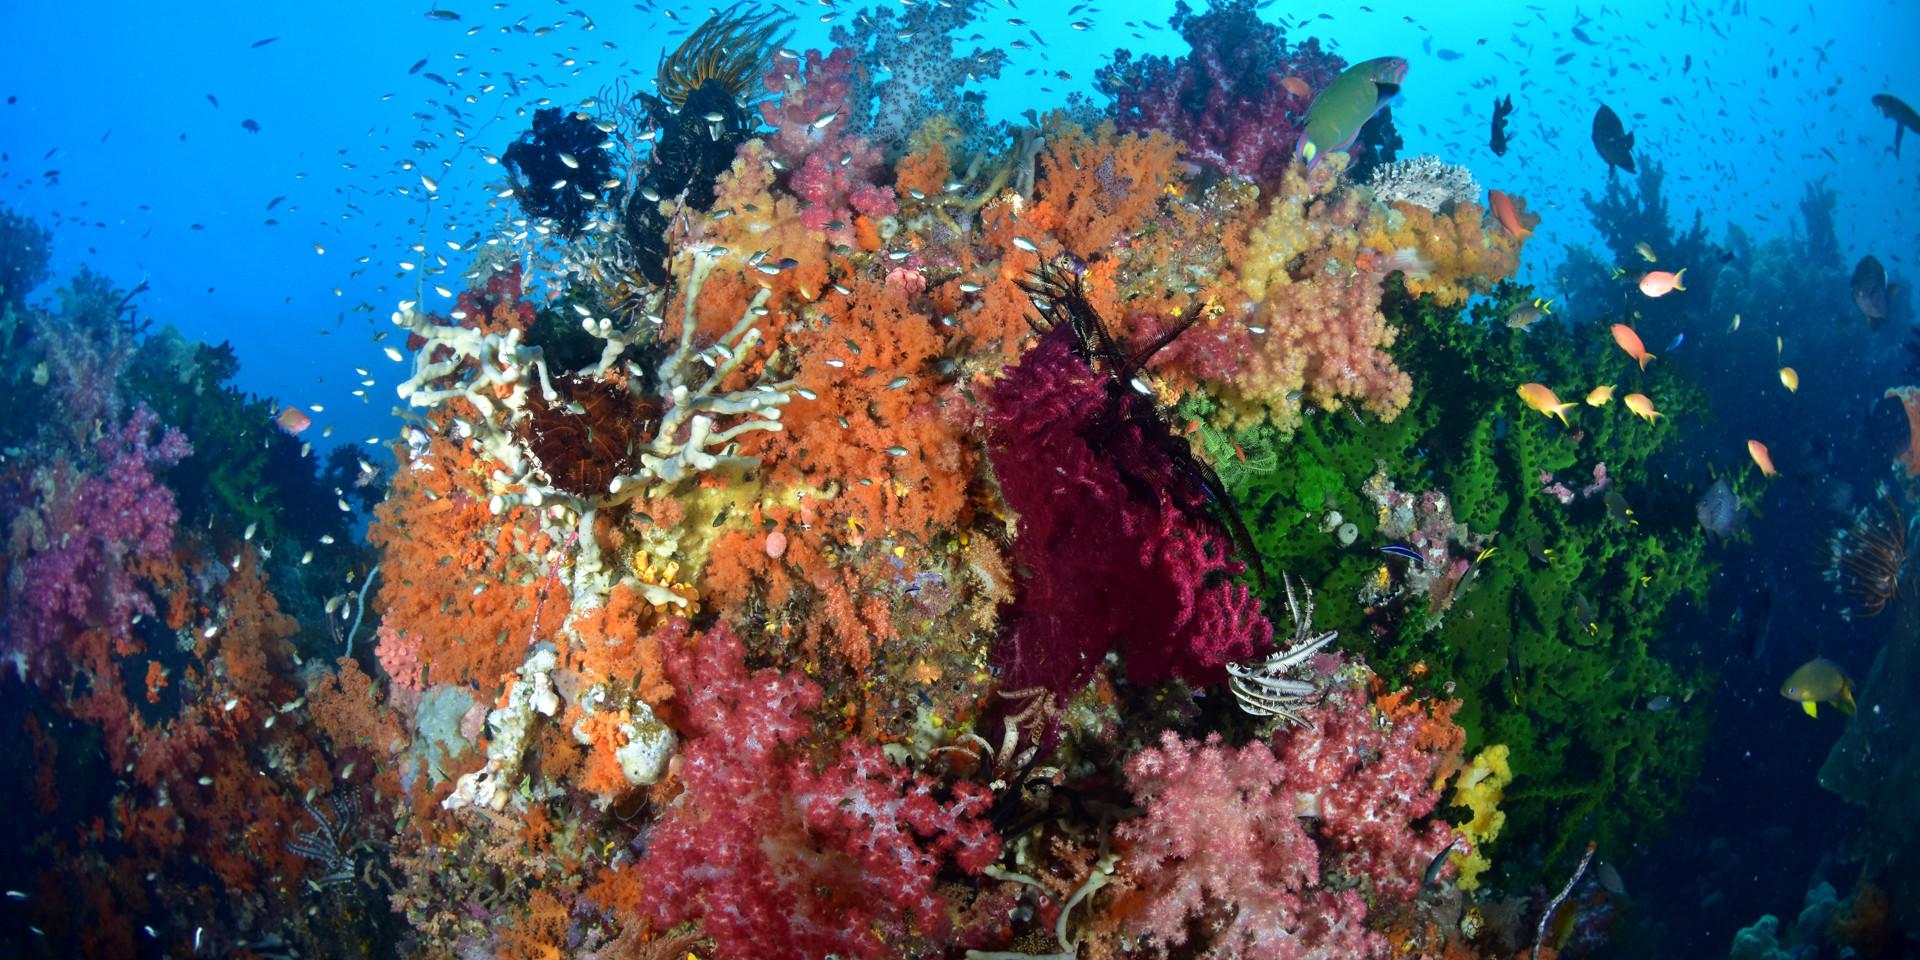 Mebios Tauchreisen, Meeresbiologische Se